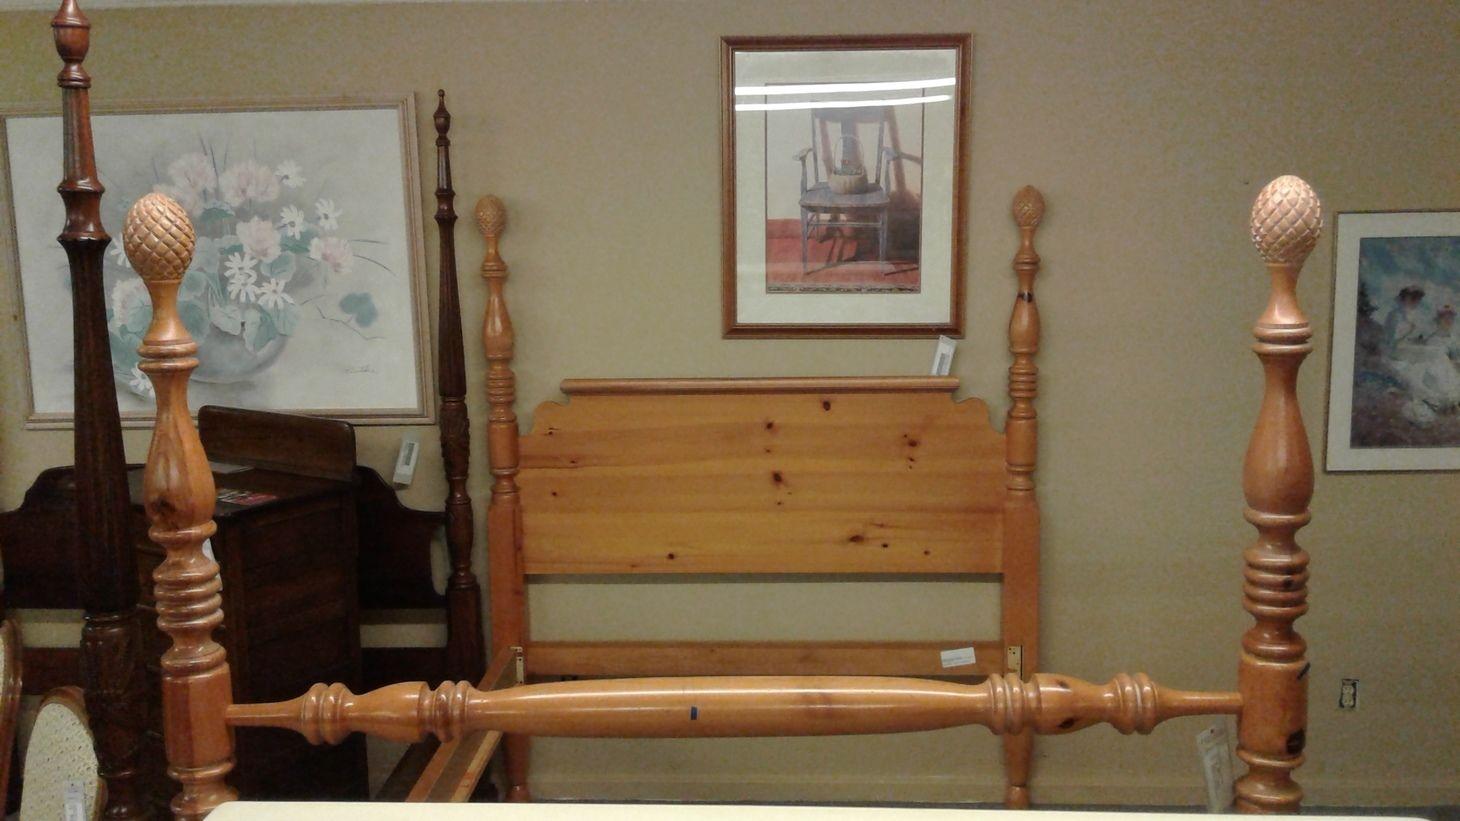 PINEAPPLE POST QUEEN BED Delmarva Furniture Consignment